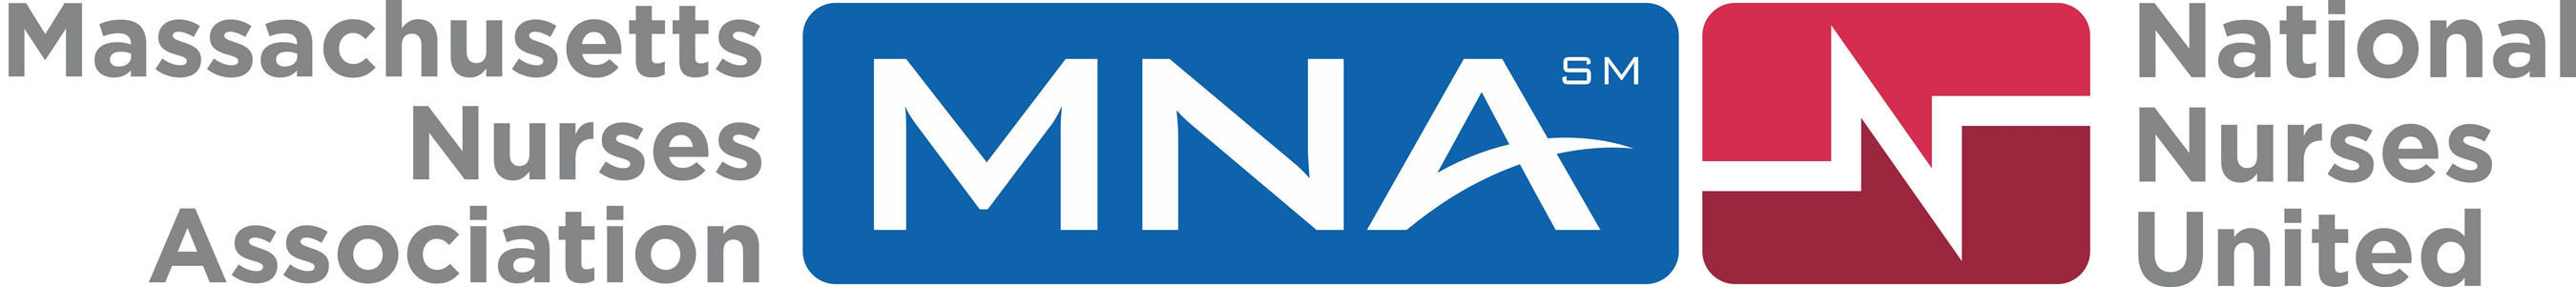 Massachusetts Nurses Association logo. (PRNewsFoto/Massachusetts Nurses Association)